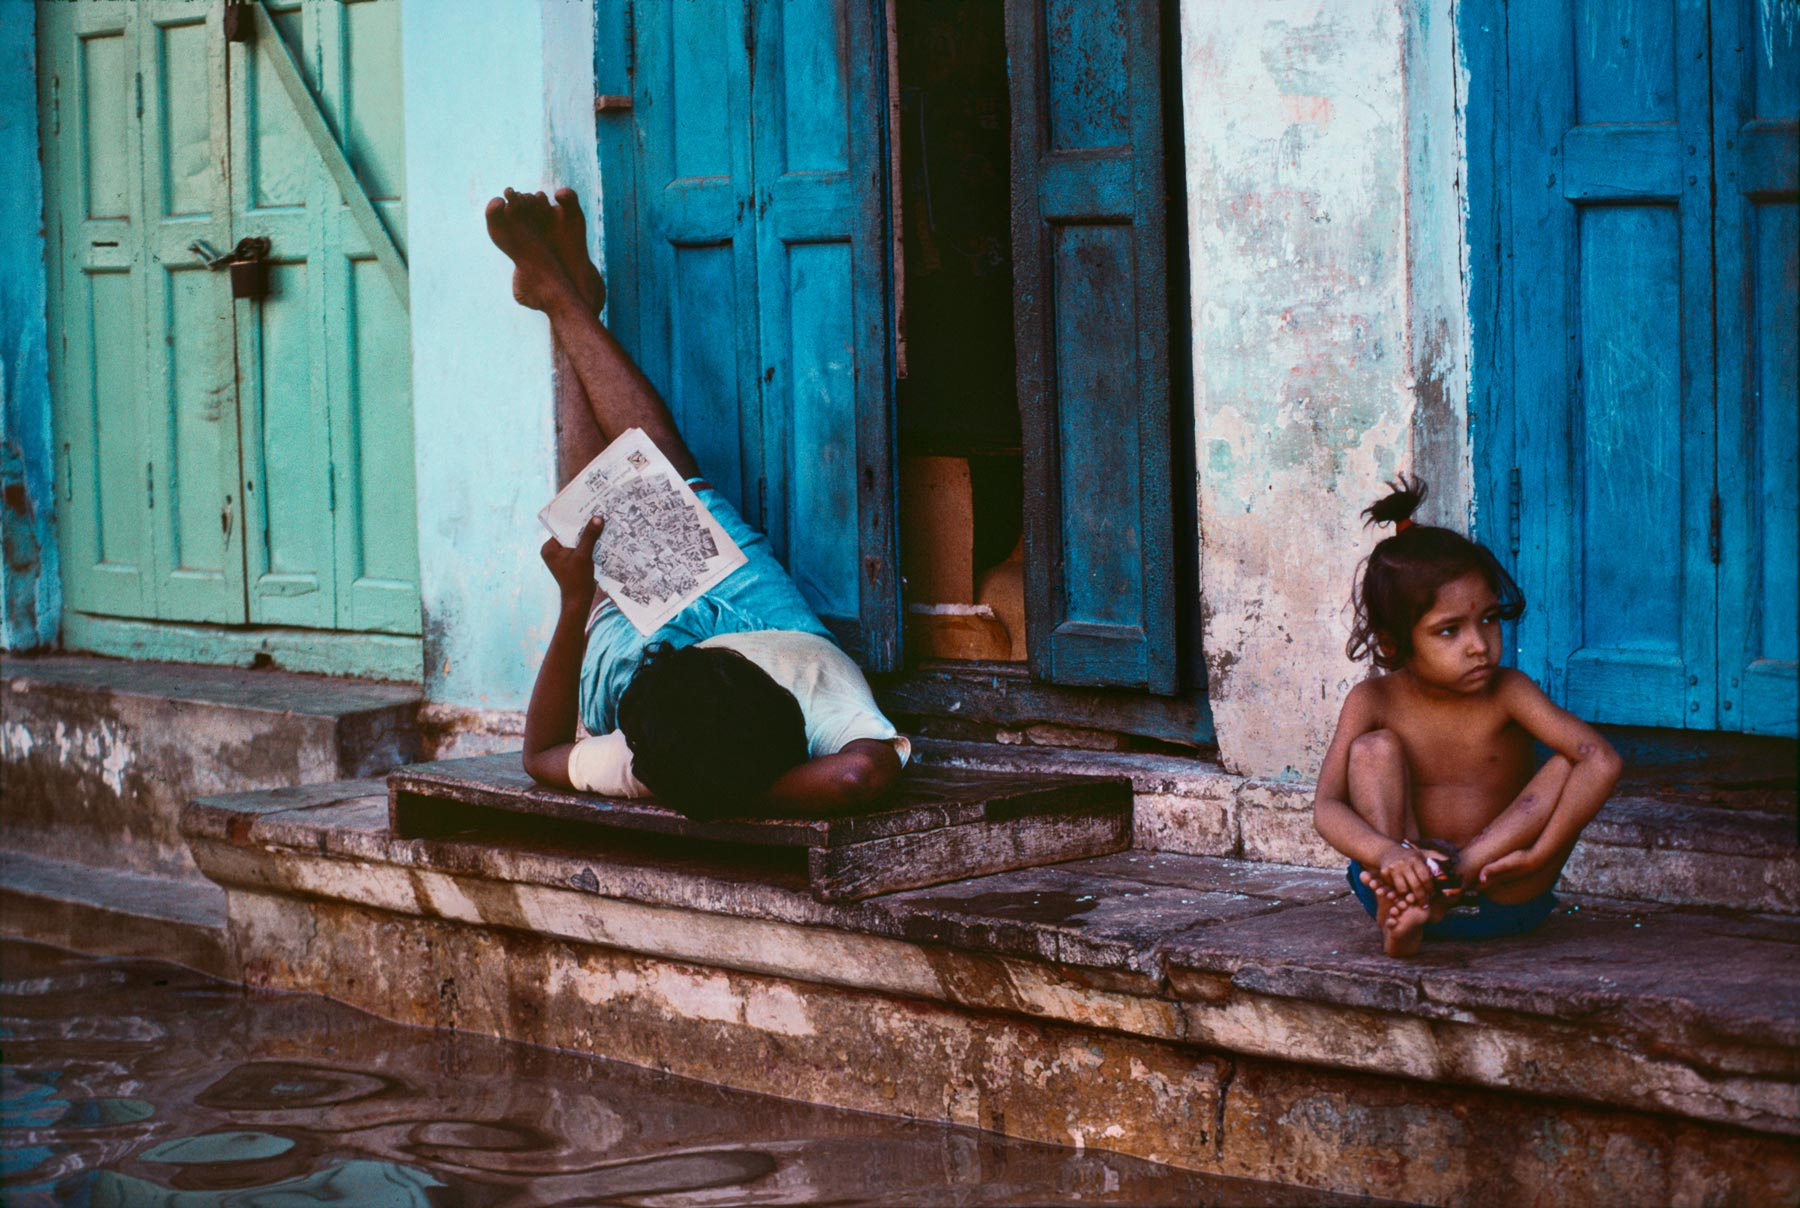 Varanasi, India - Steve McCurry photography